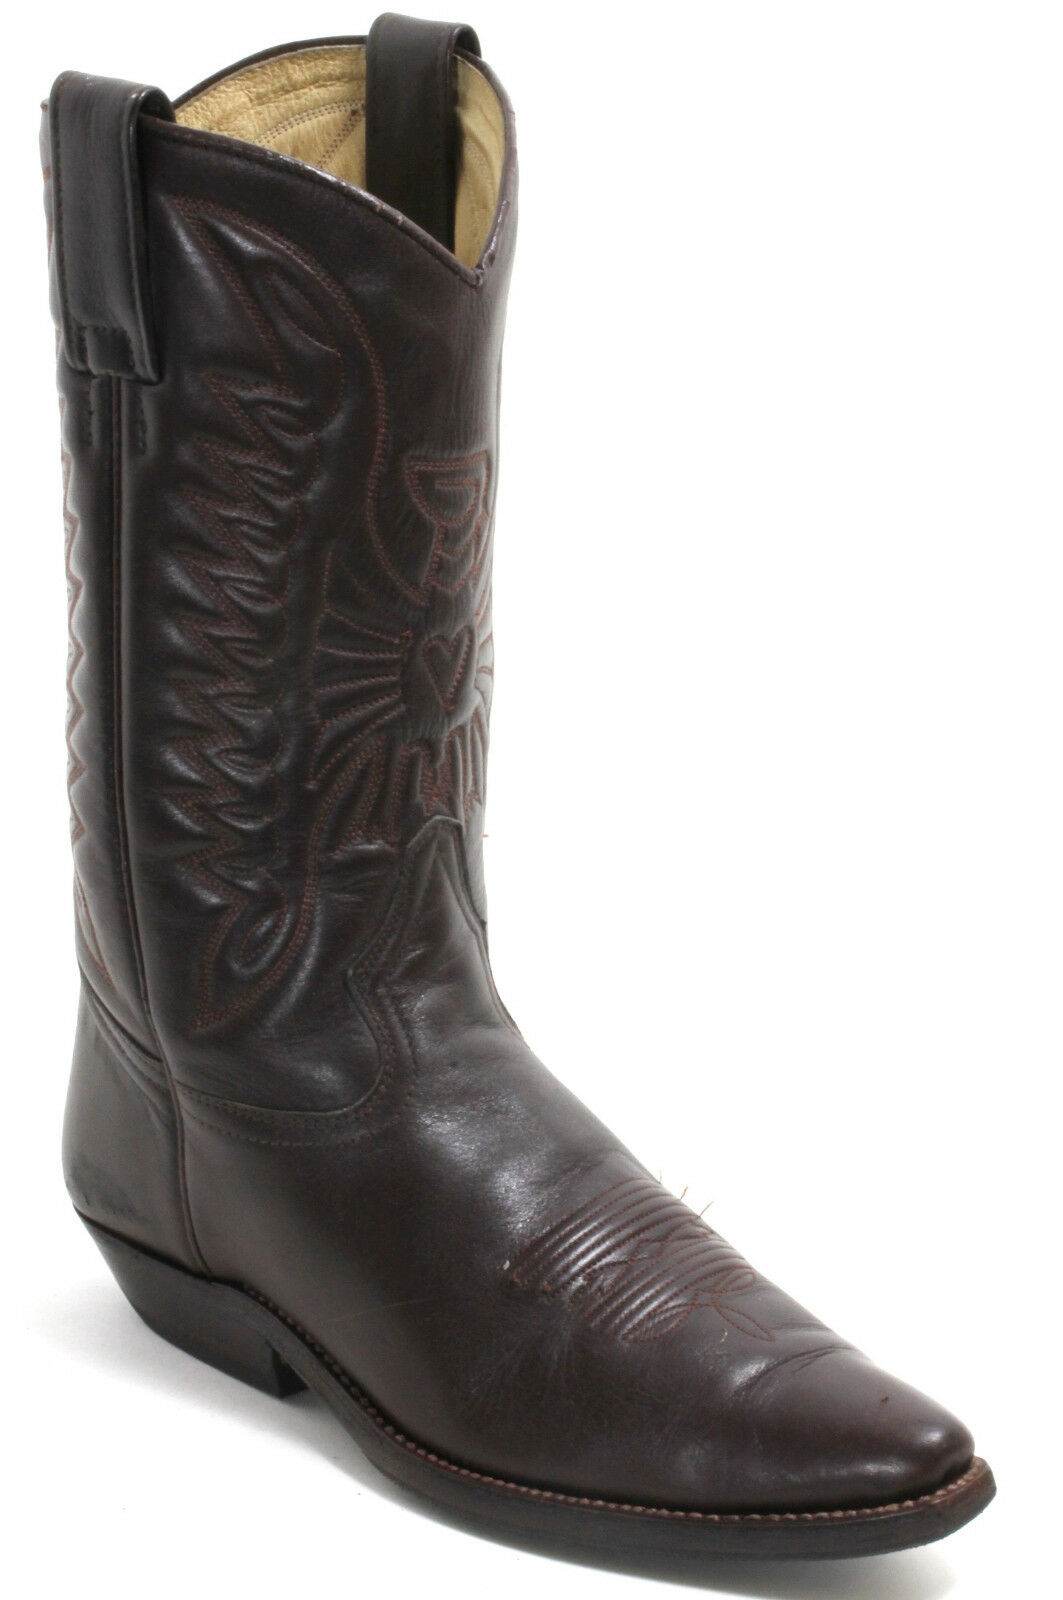 Westernstiefel Cowboystiefel Catalan Style Line Dance Texas Primeboots 41